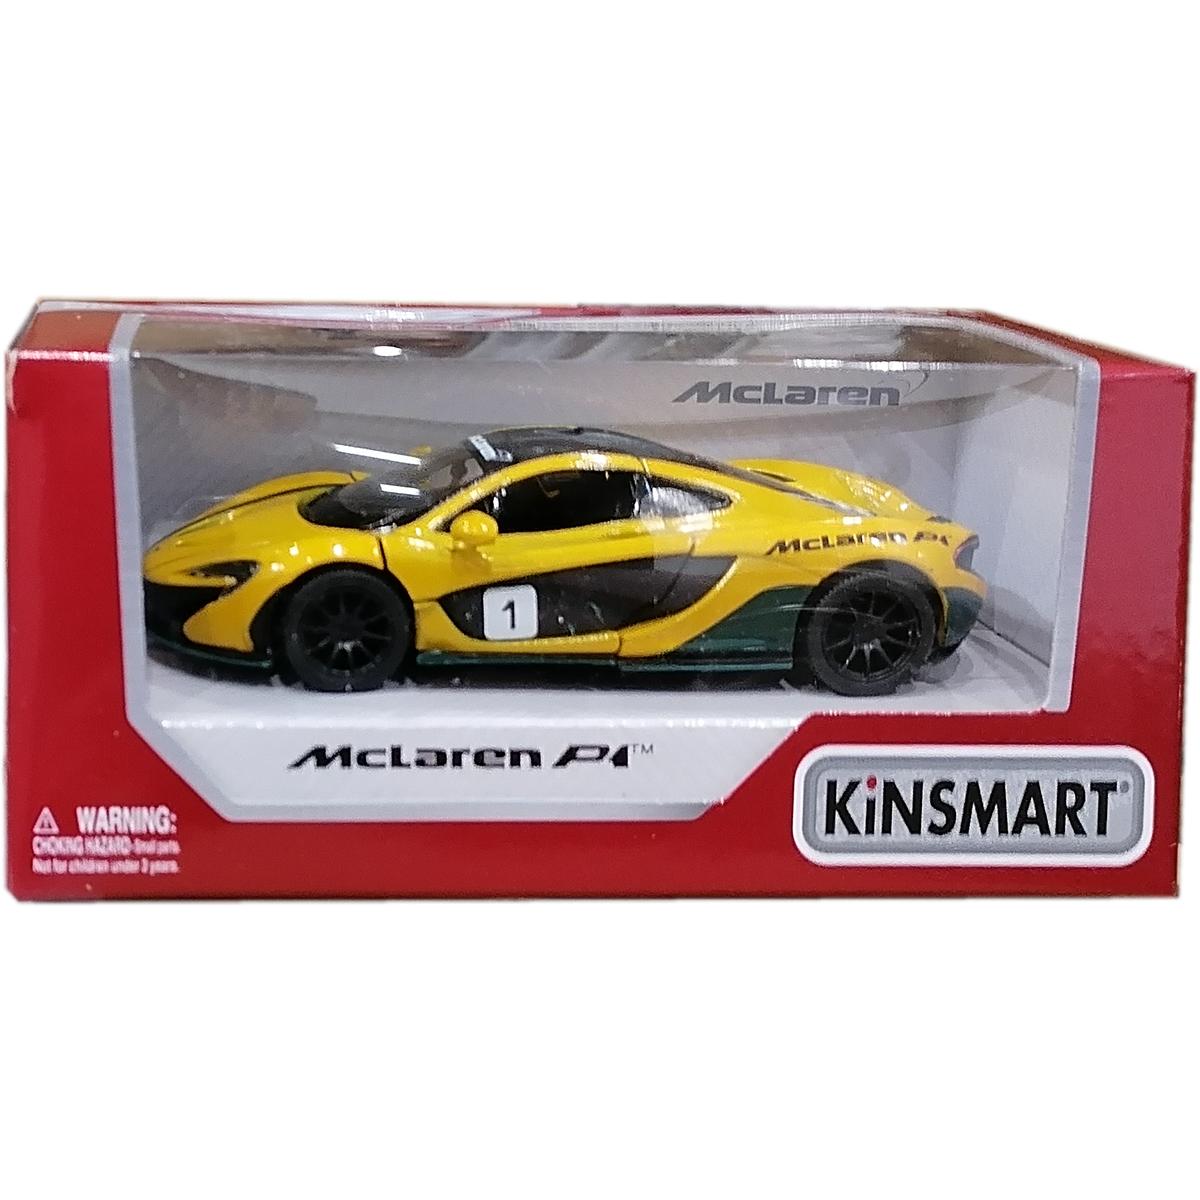 Masinuta din metal Kinsmart, McLaren P1, Galben